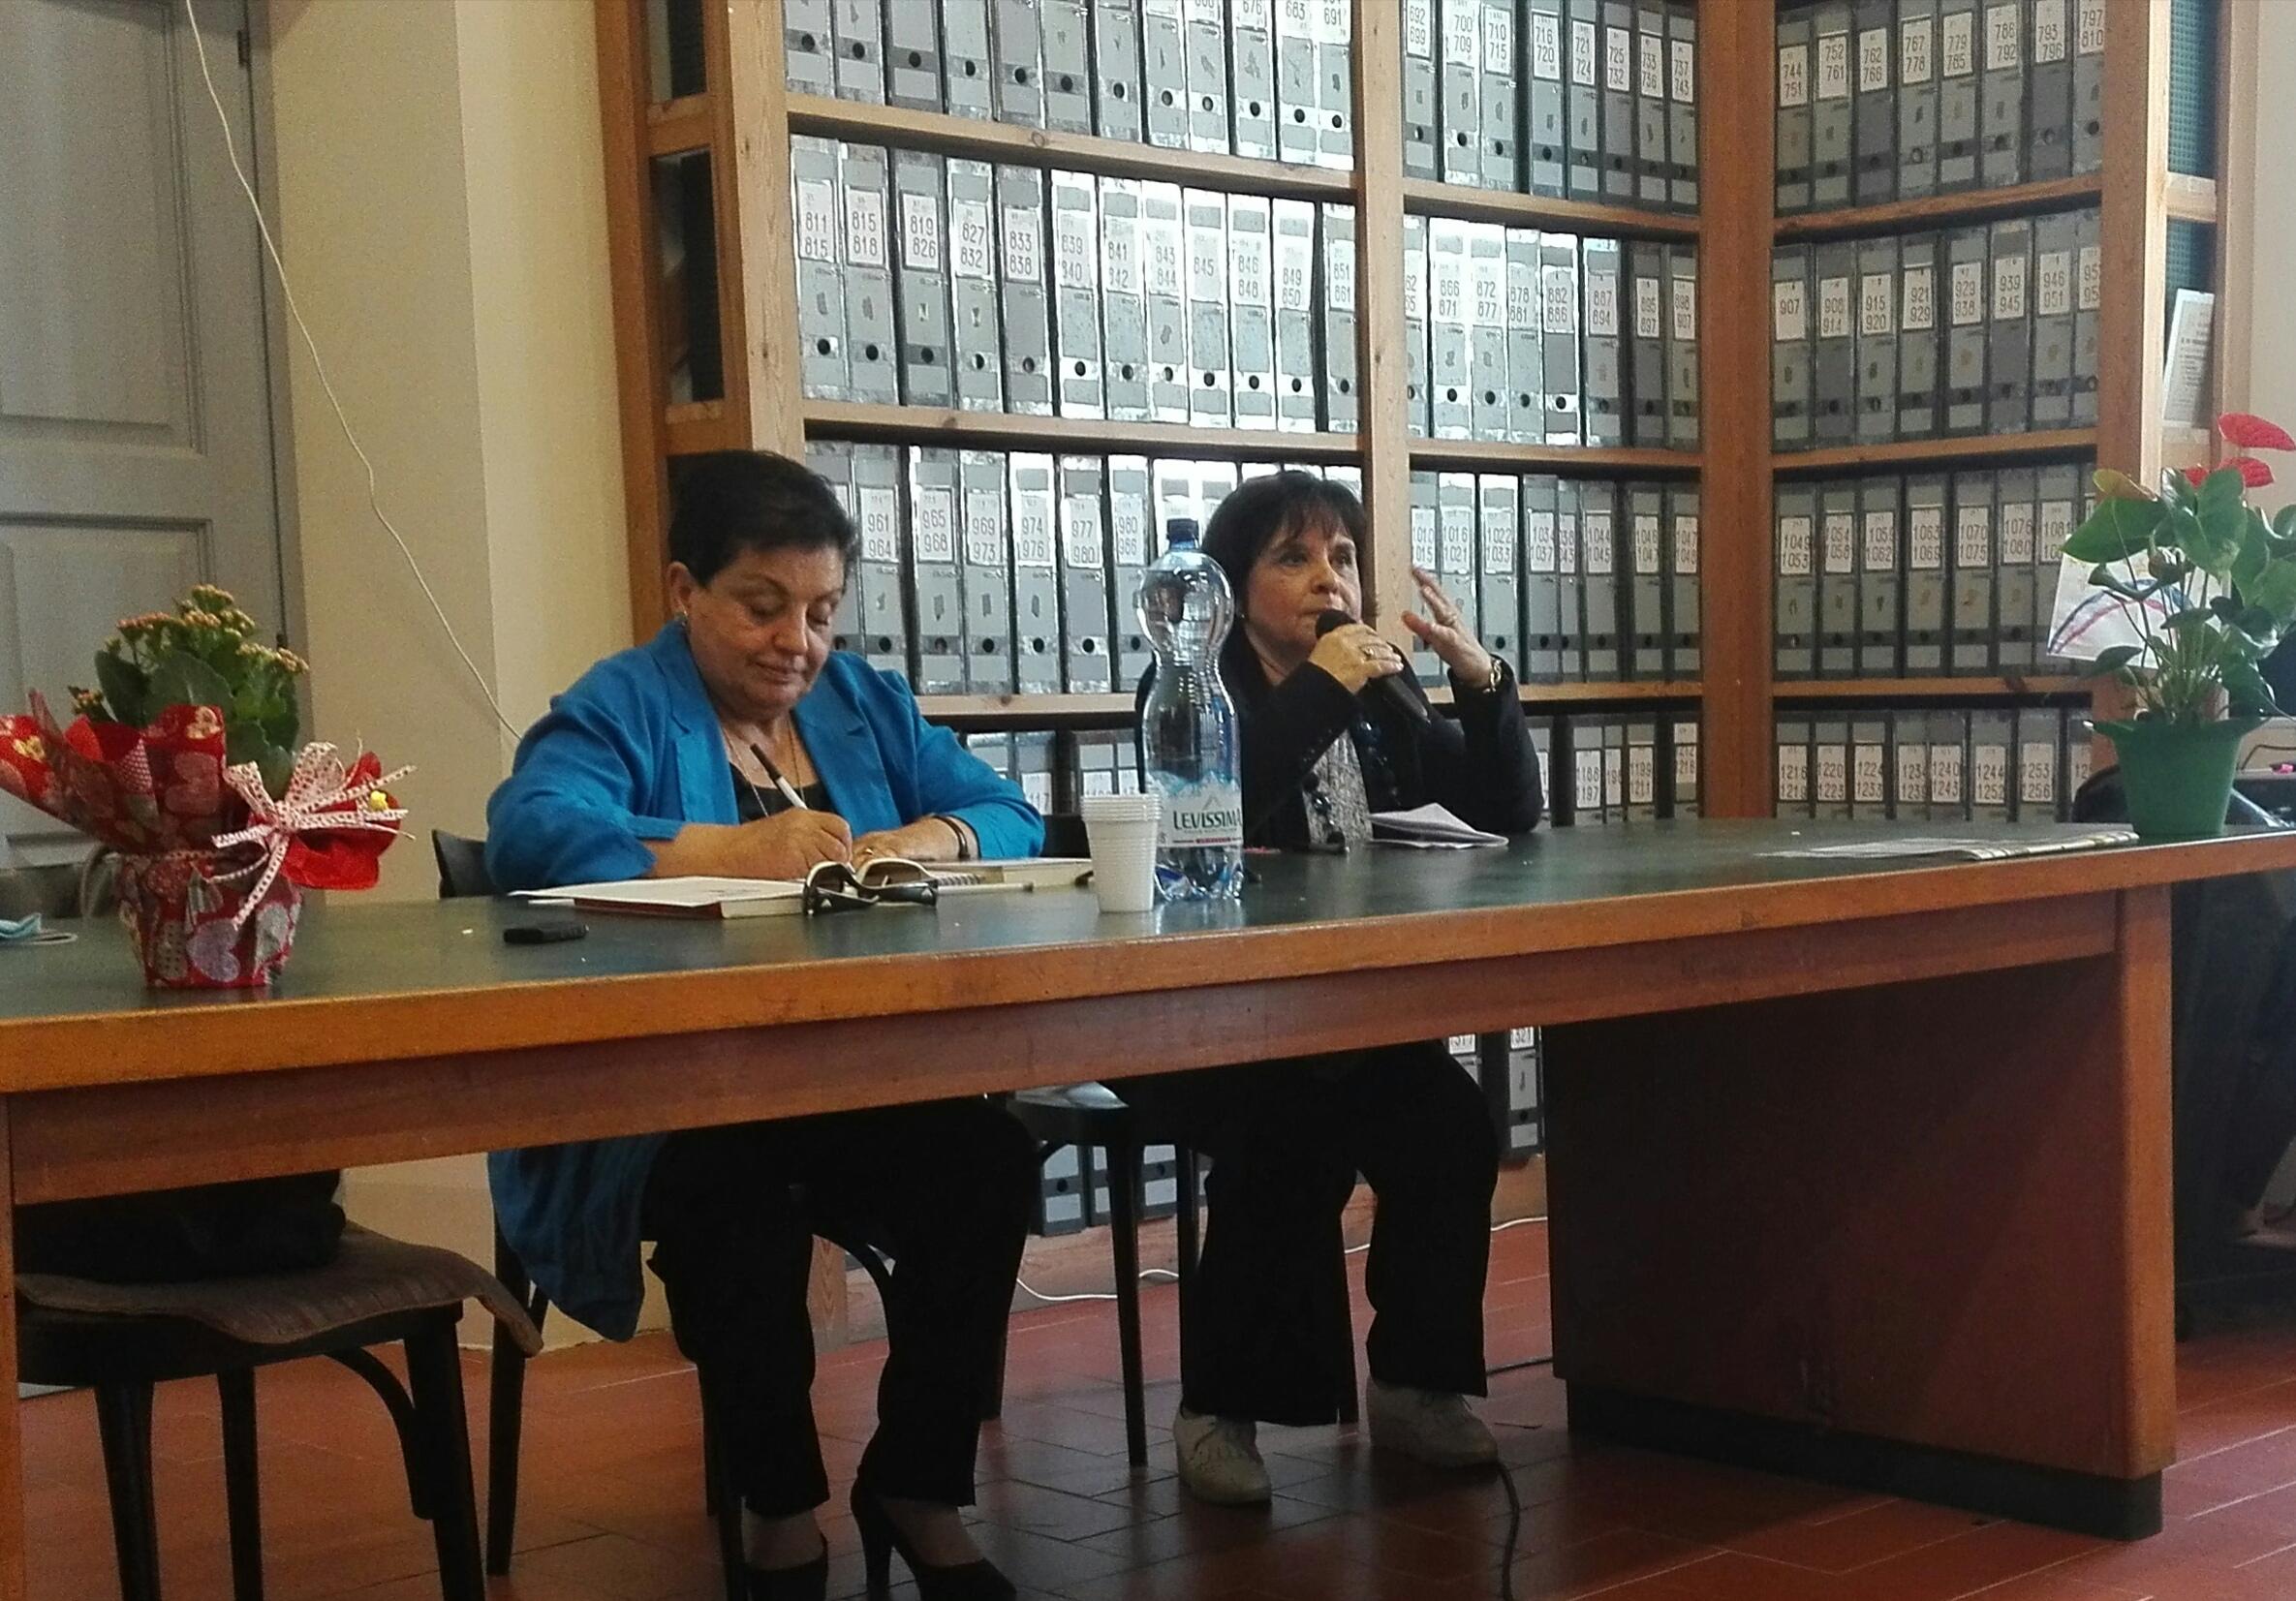 Micaela Procaccia- Direzione Generale Archivi